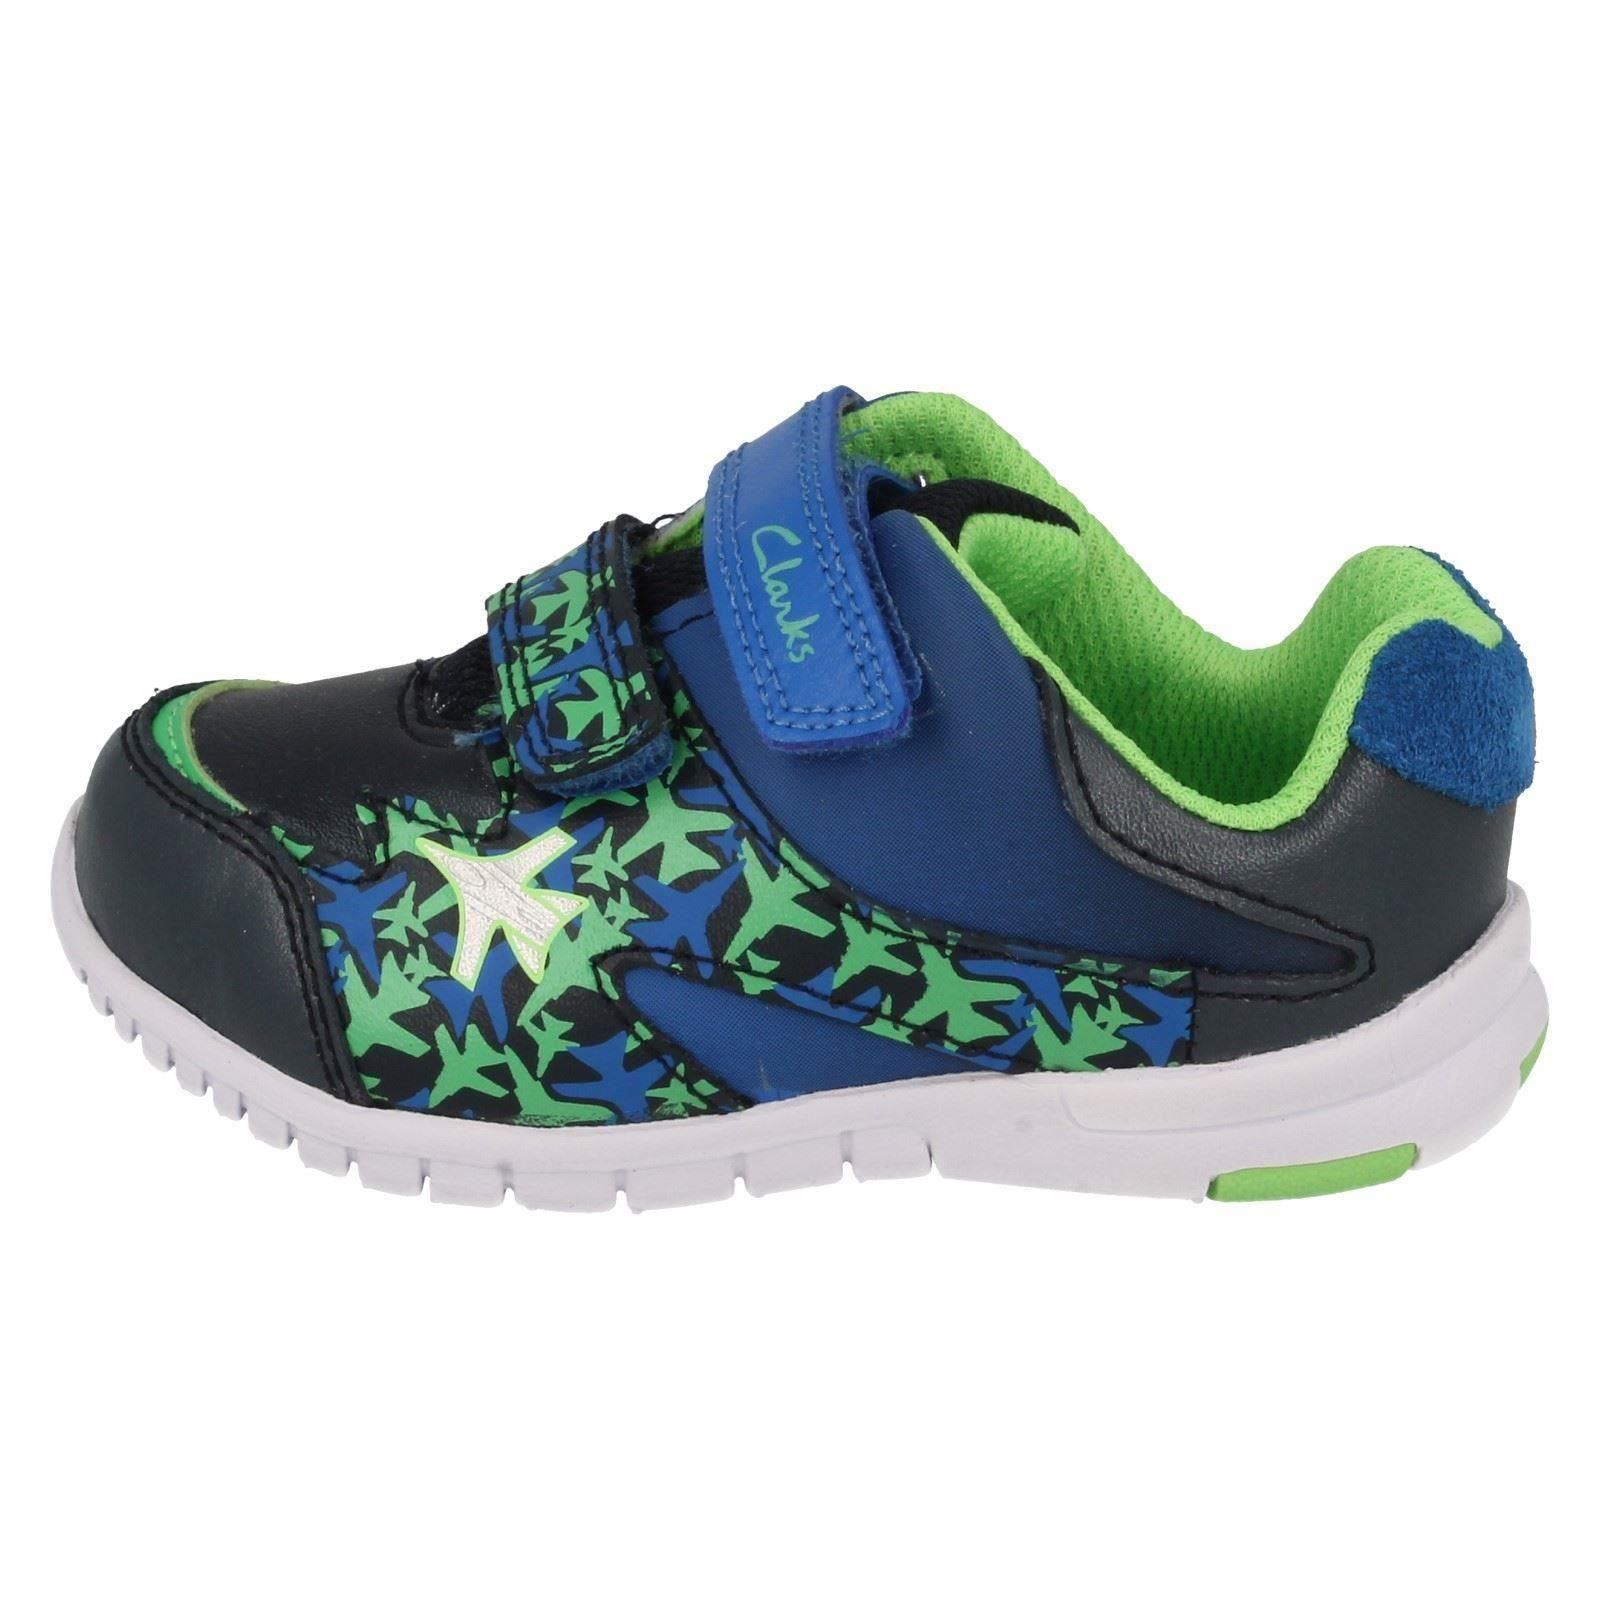 Clarks Zoom Zapatos Primeros ' Azon Niños d0zq81wx8